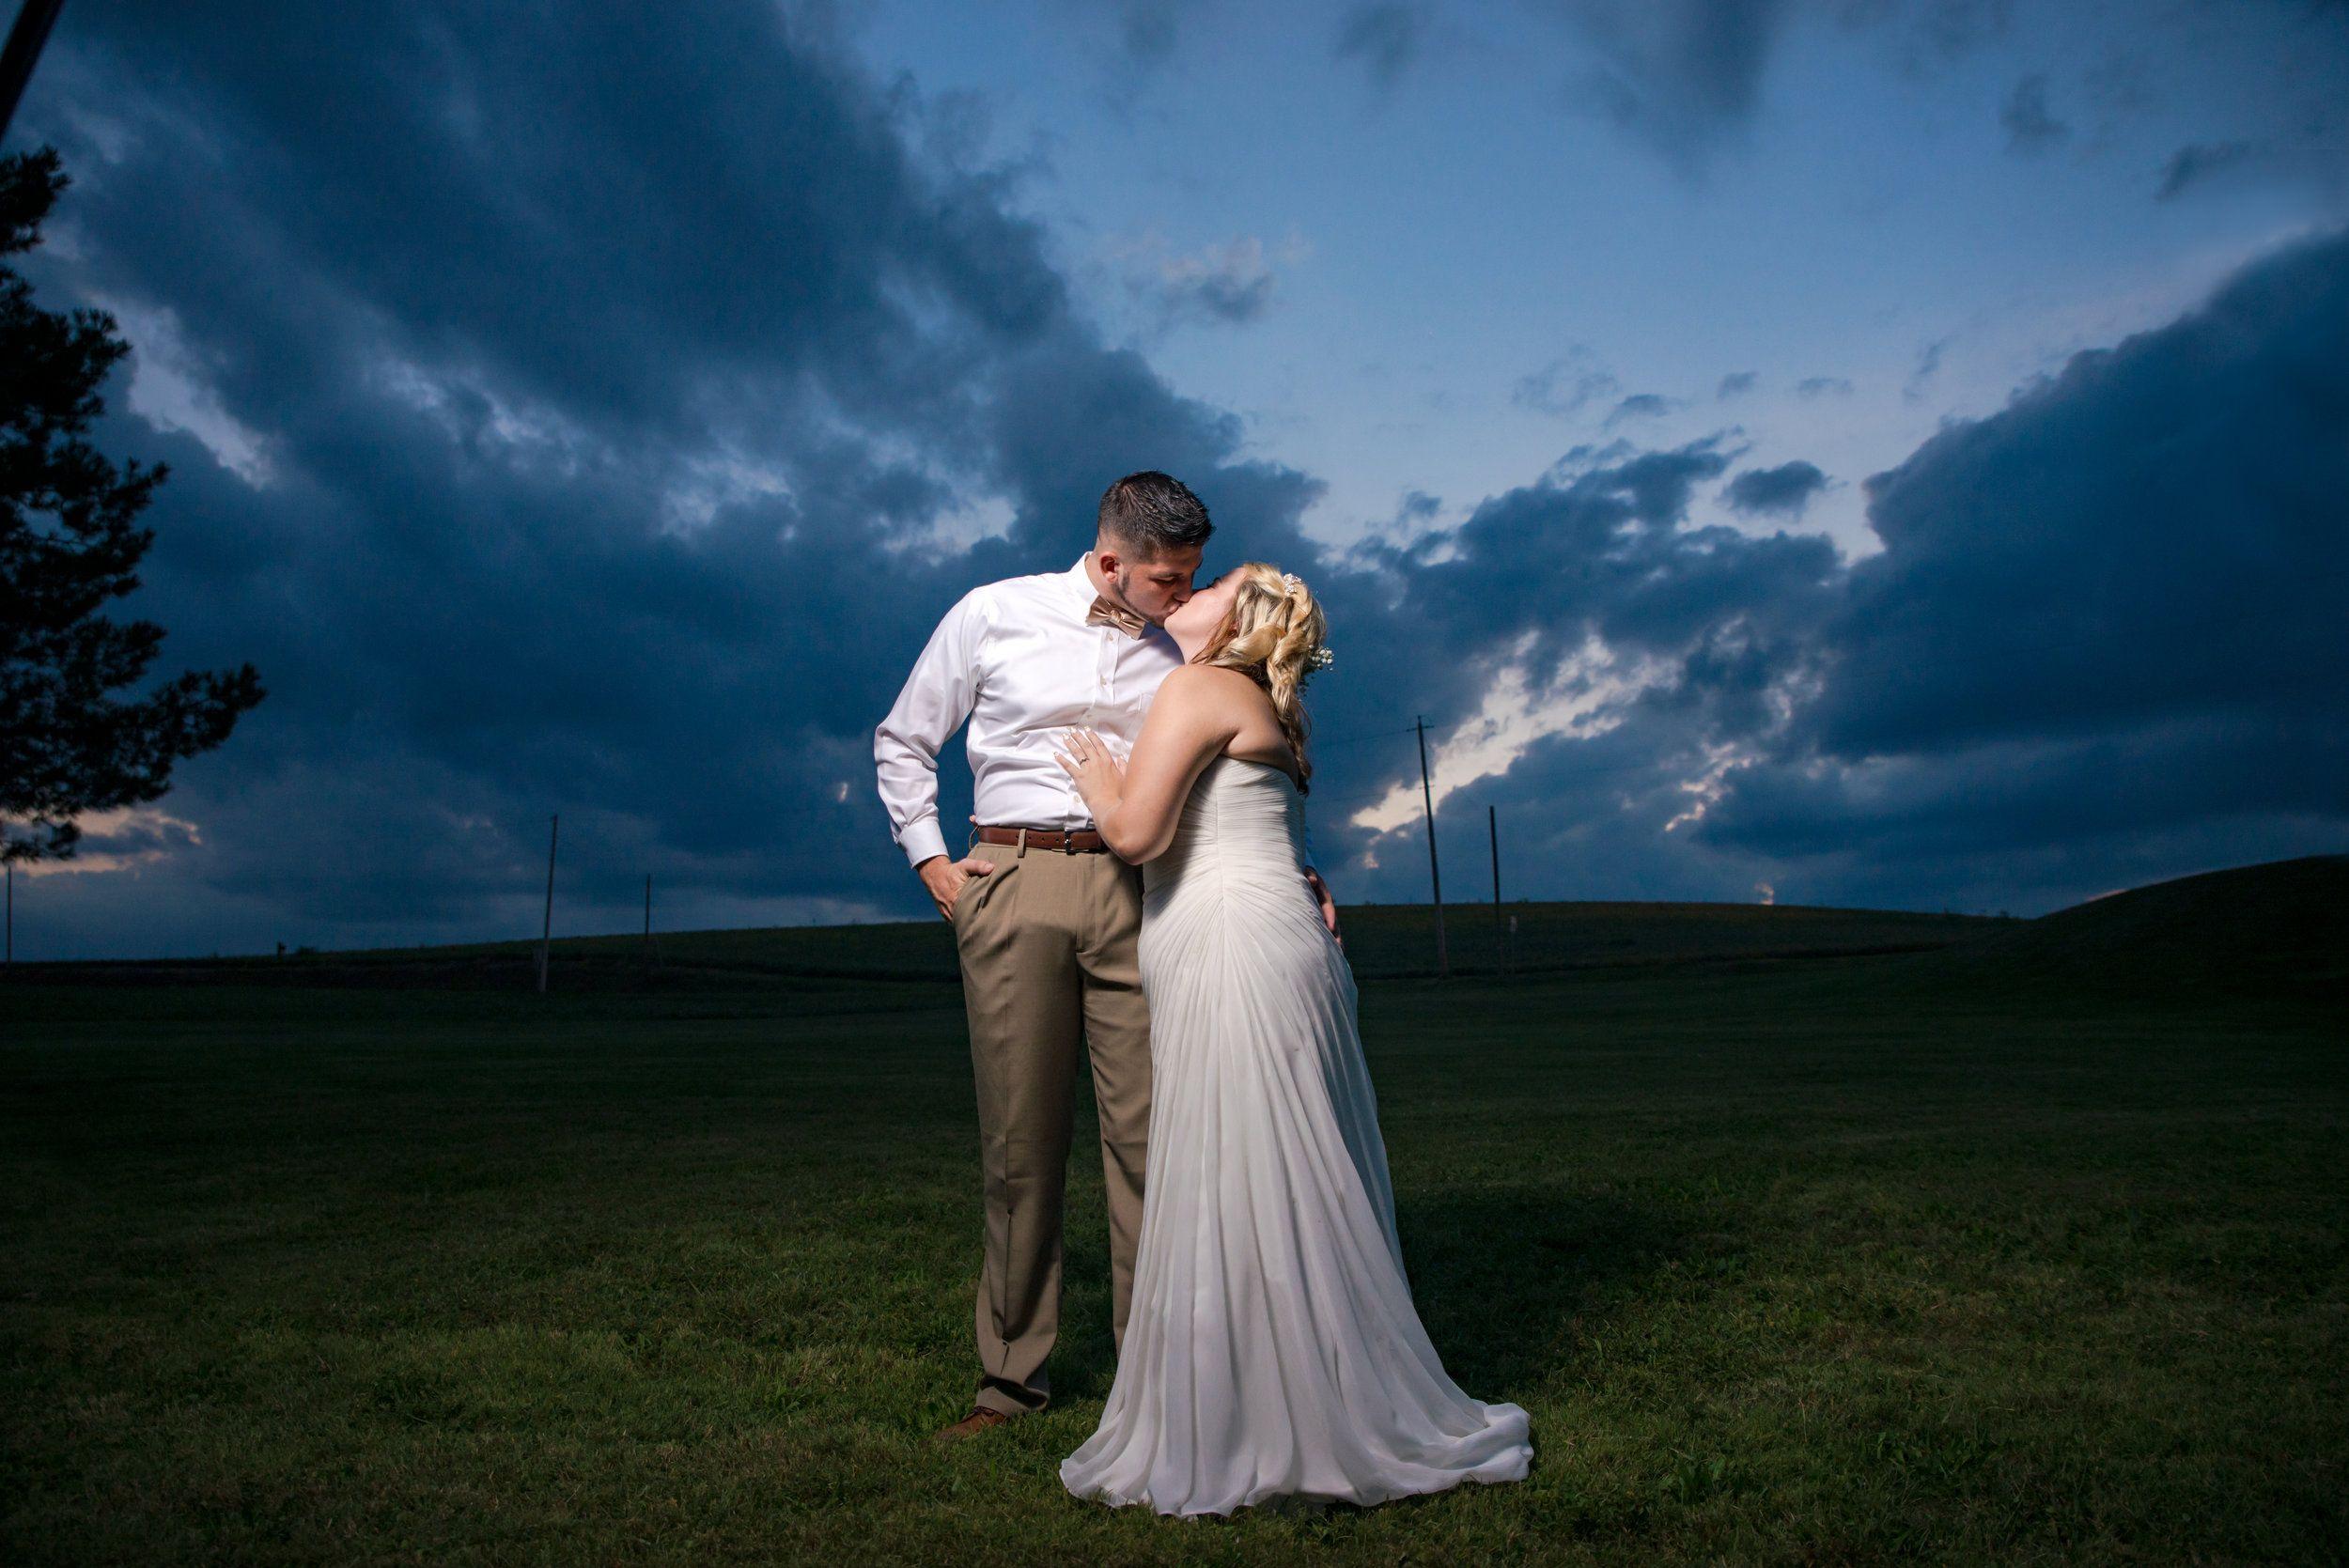 Alex Hunter Have A Low Key Farm Wedding In New Freedom Pa Farm Wedding Wedding Couples Photography New Freedom